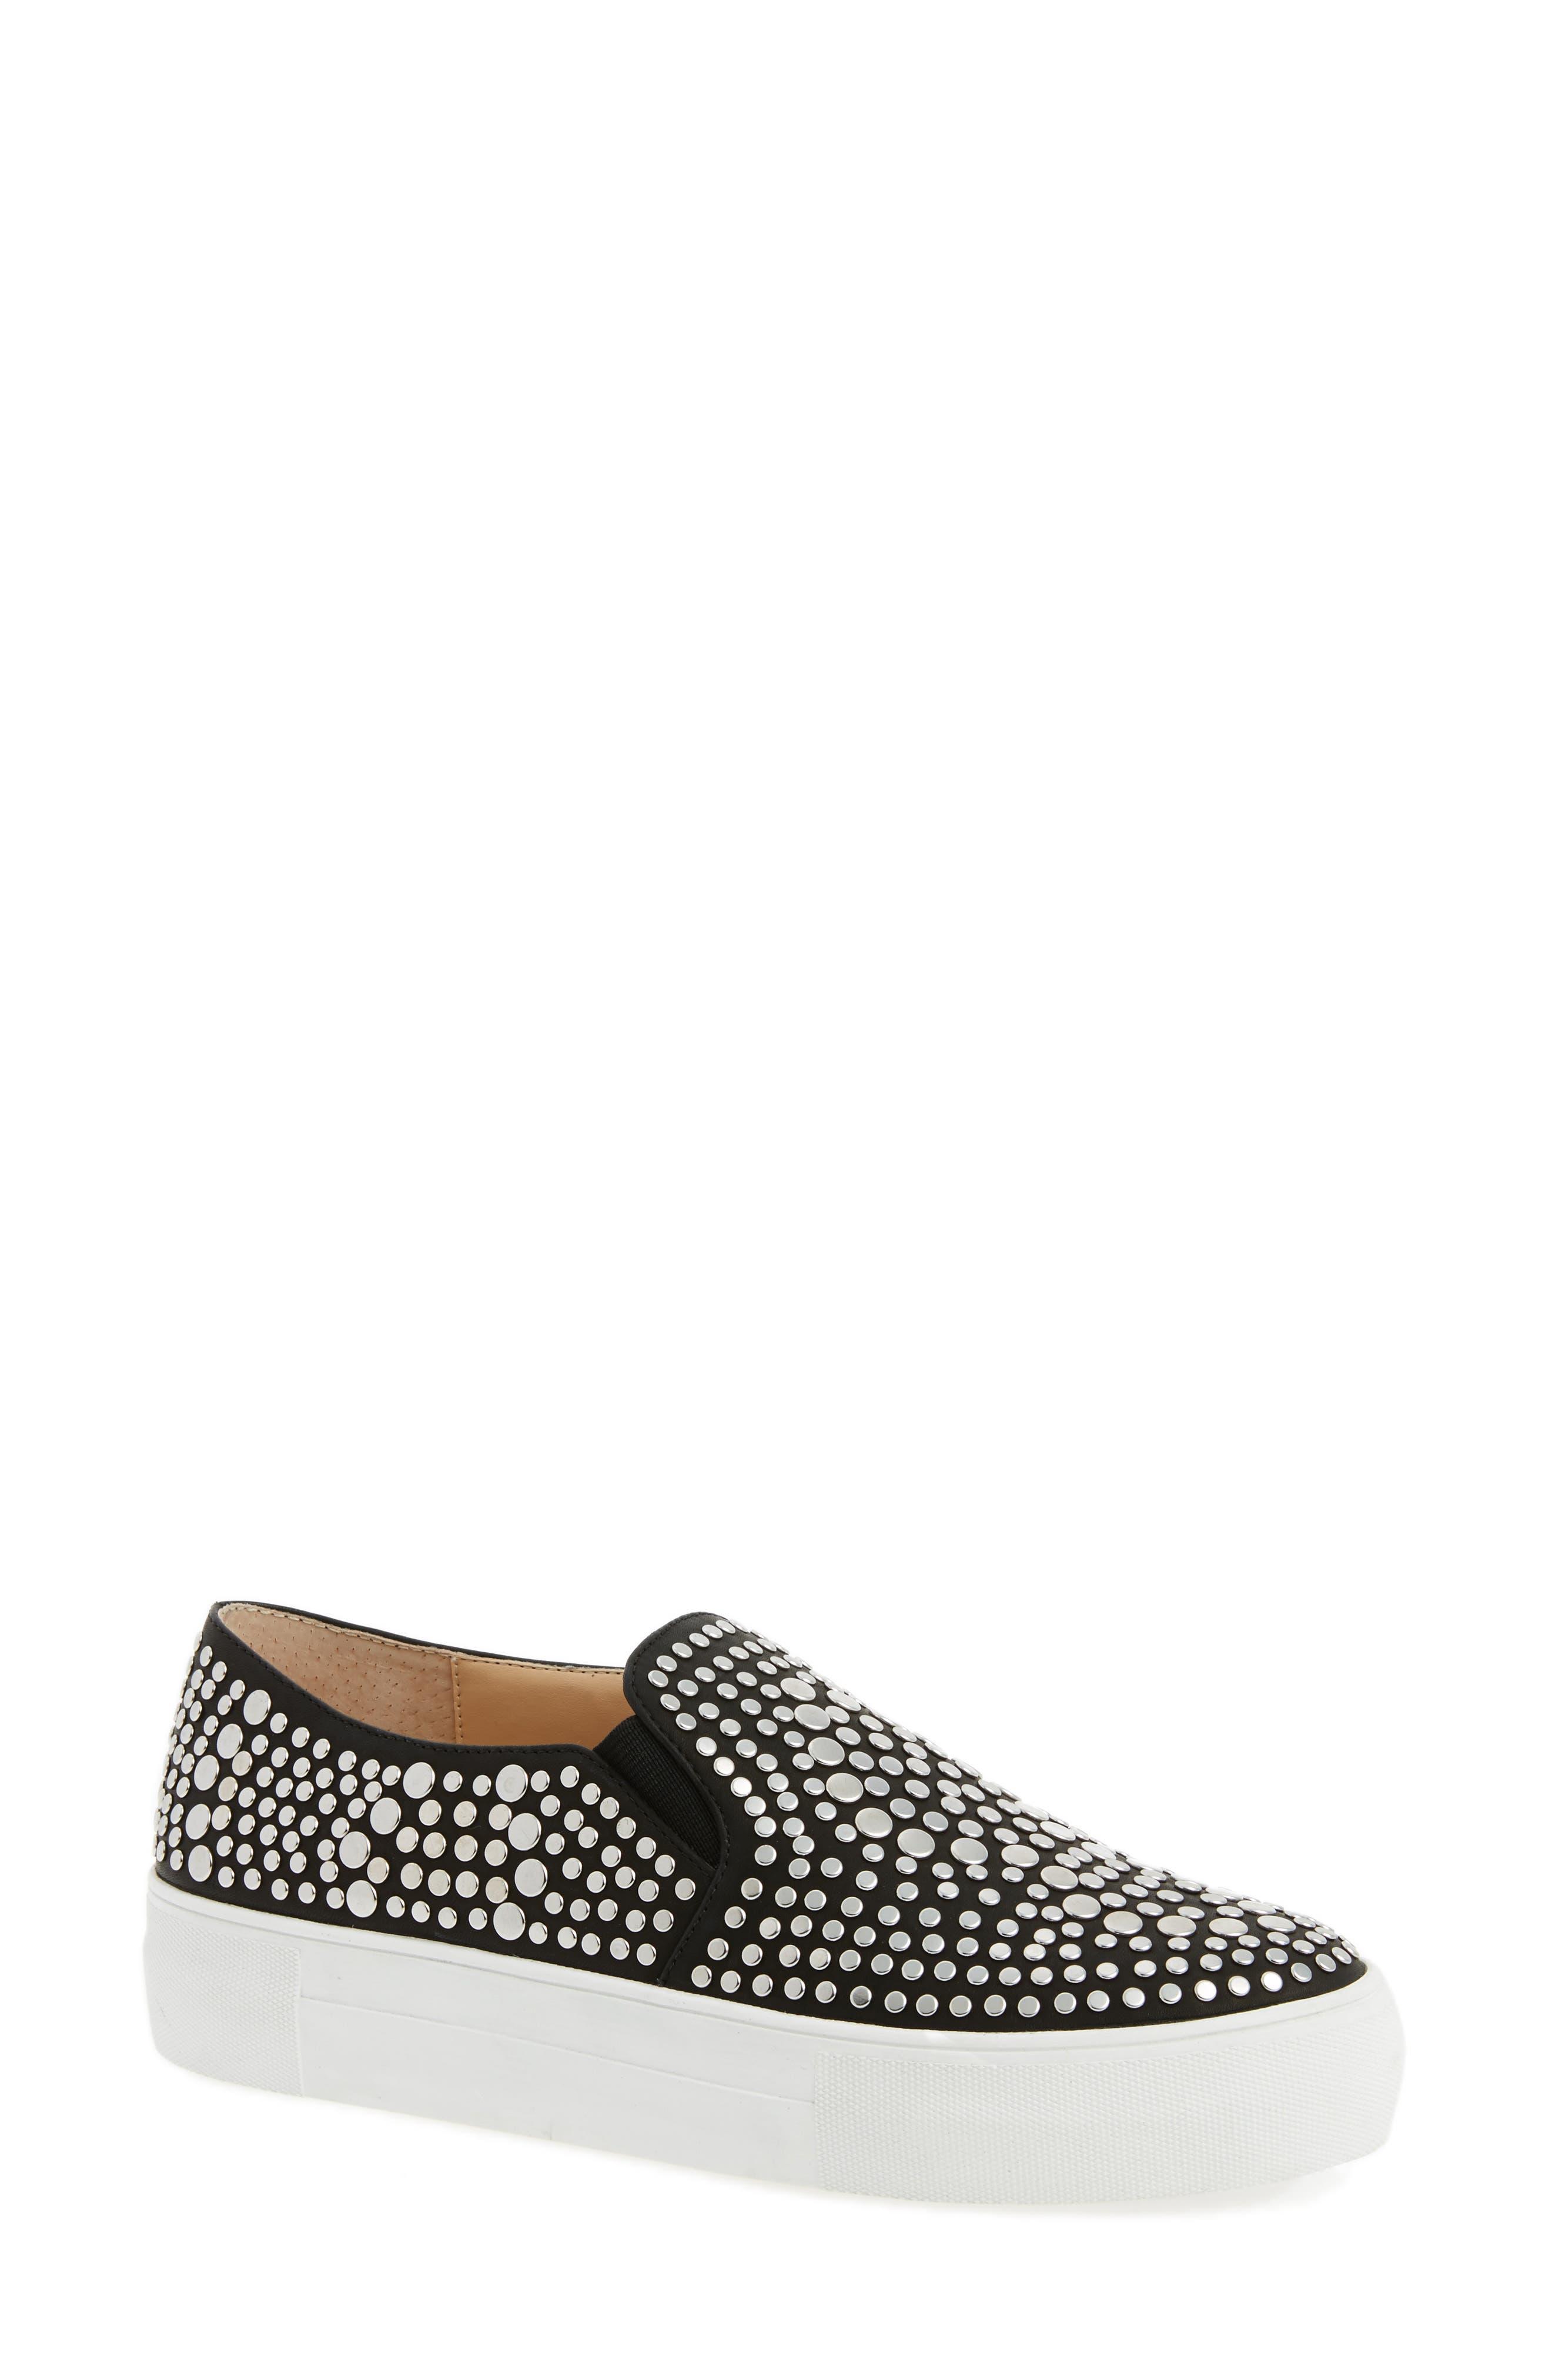 Vince Camuto Kindra Studded Slip-On Sneaker (Women)